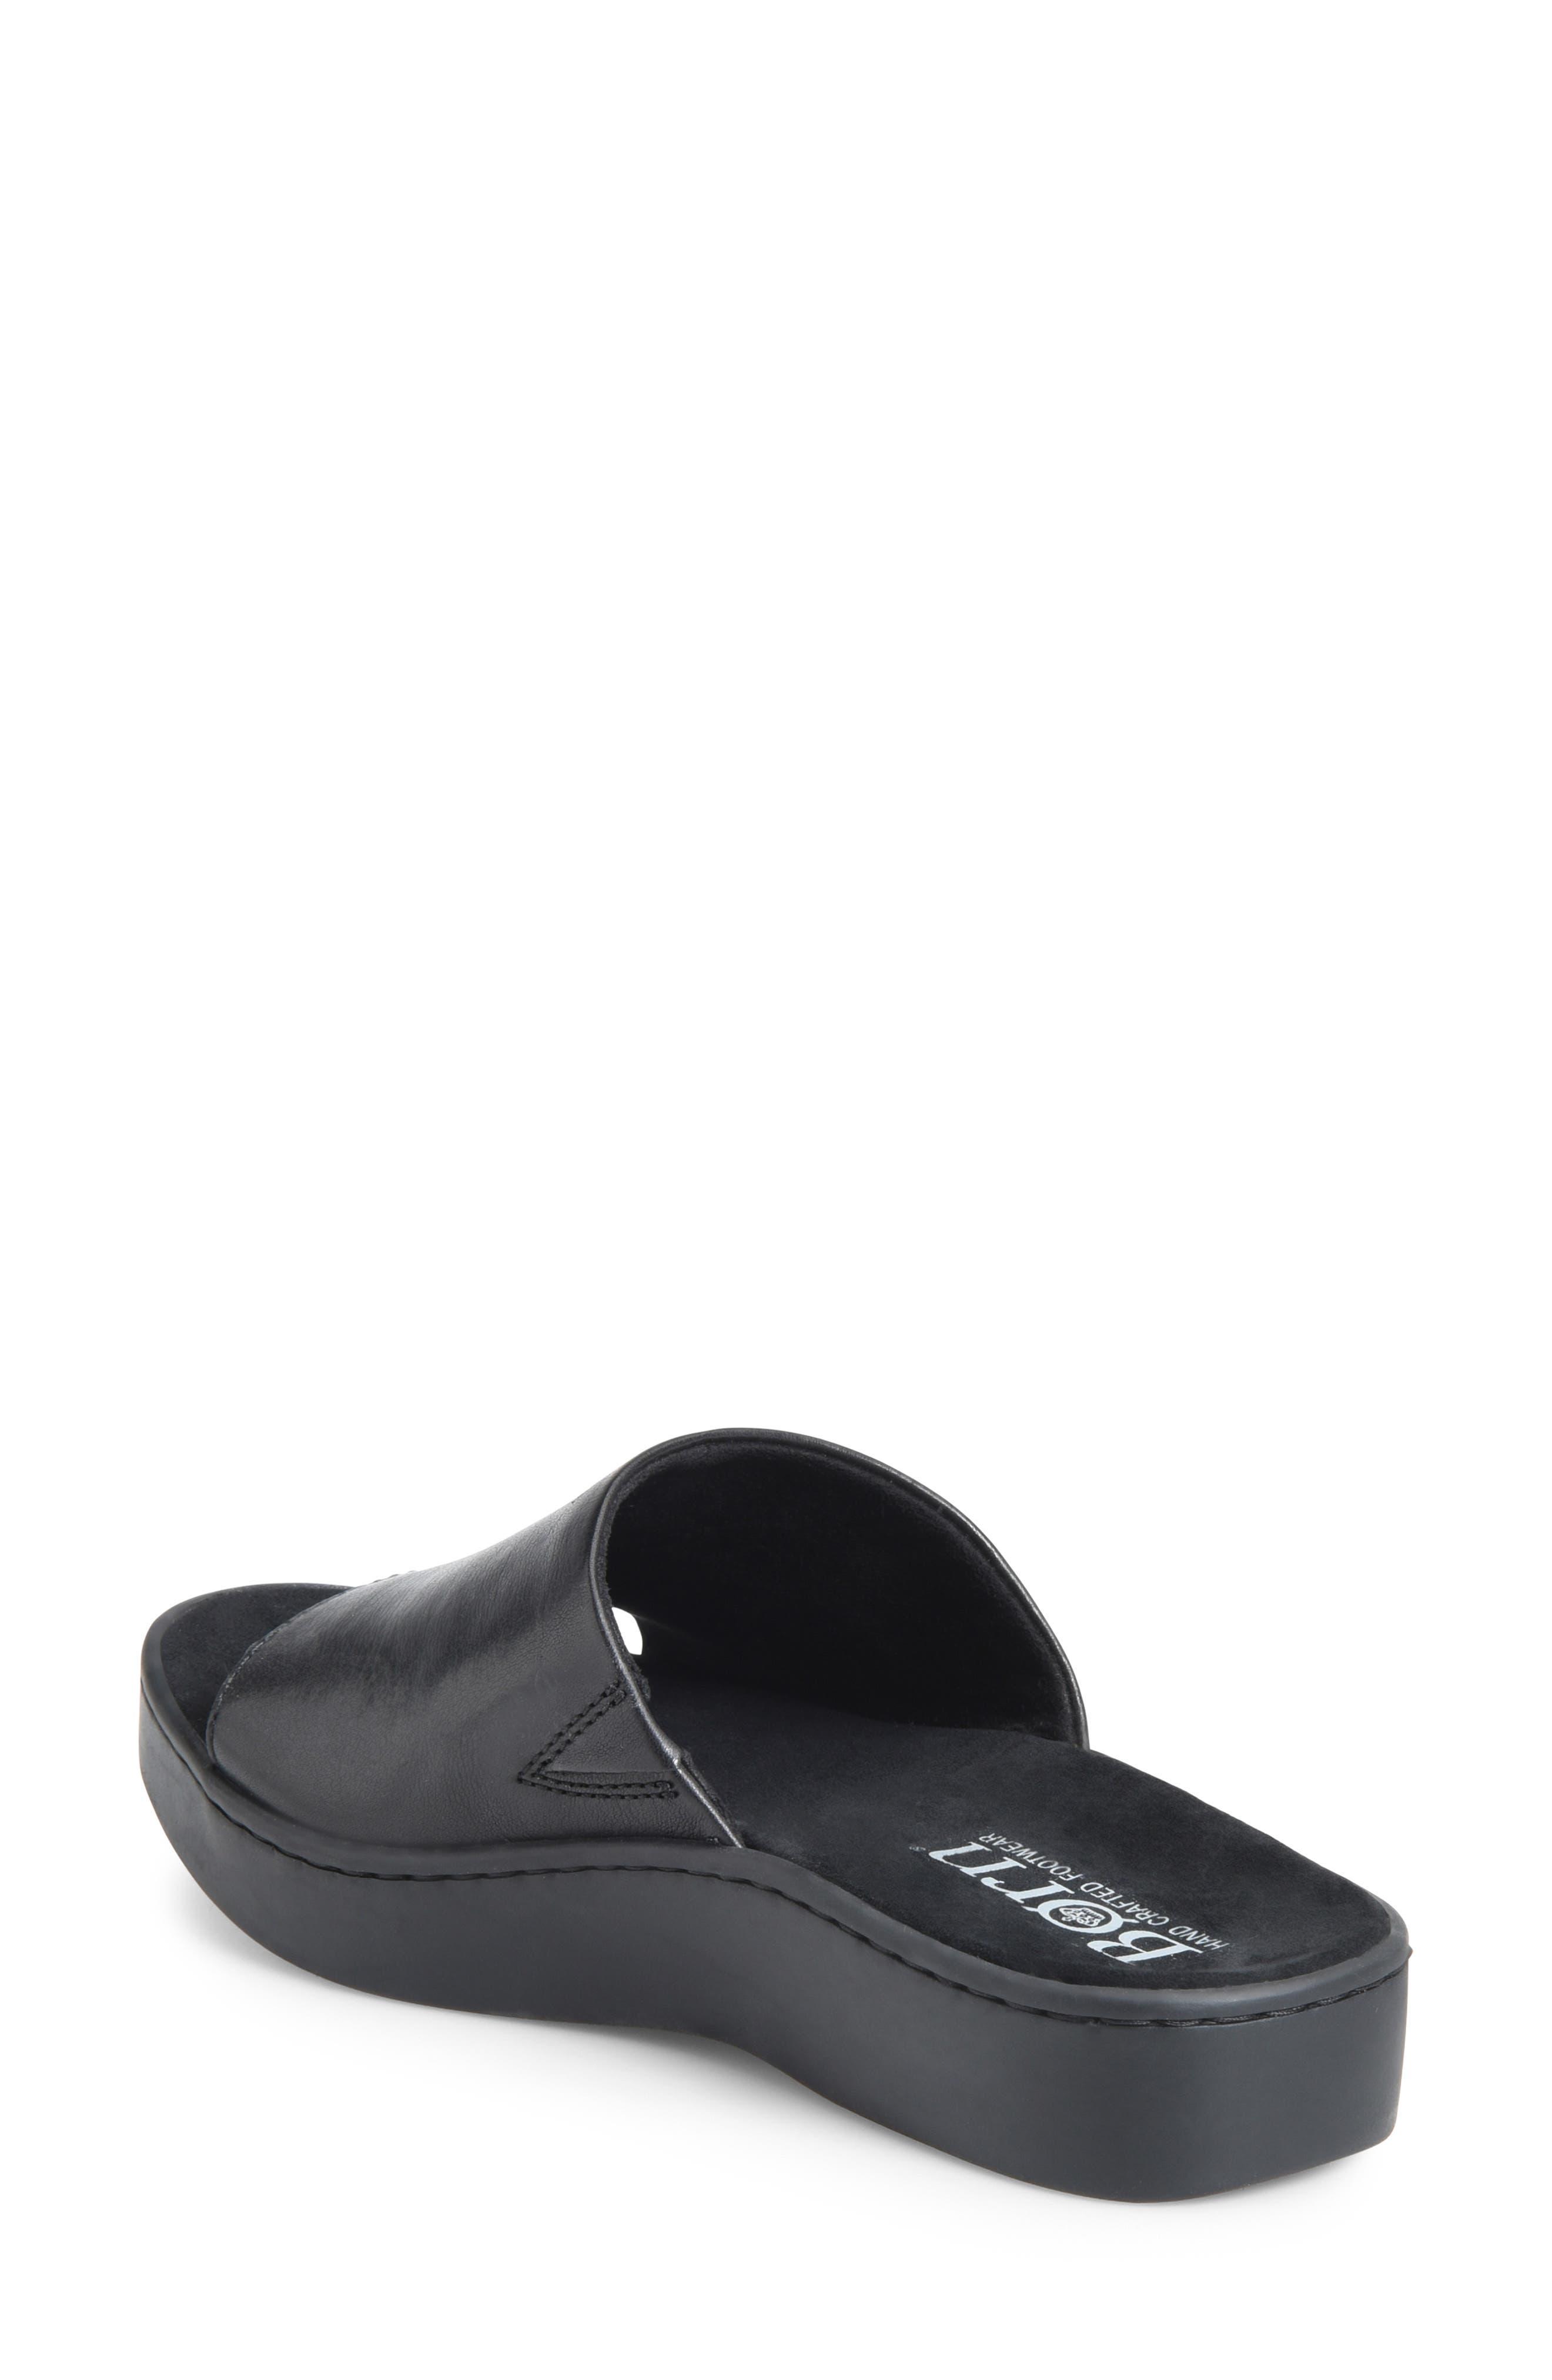 BØRN, Ottawa Slide Sandal, Alternate thumbnail 2, color, BLACK LEATHER